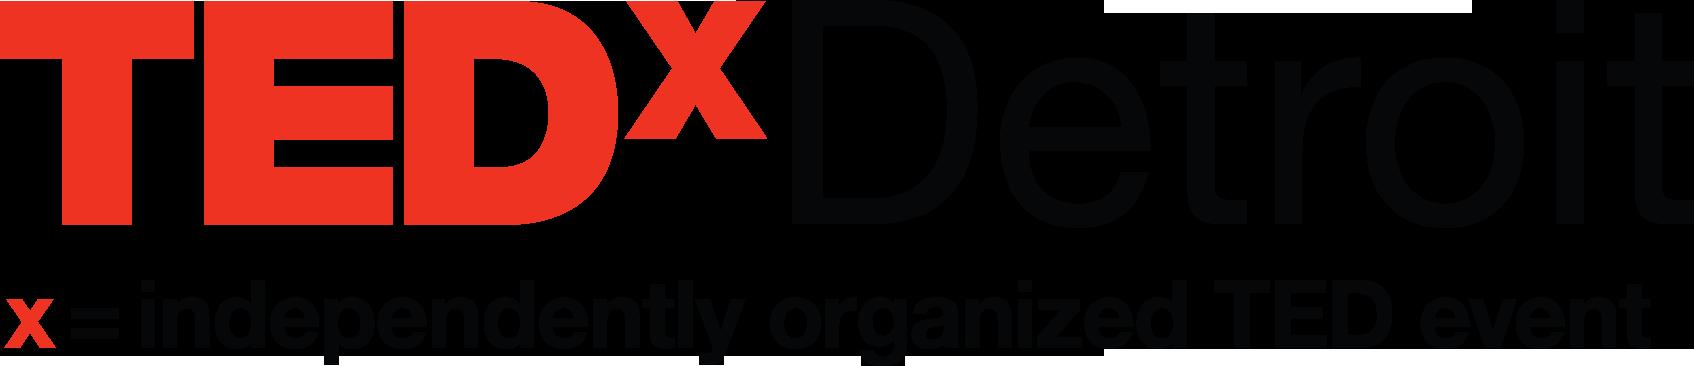 TEDxDetroitLogo.png